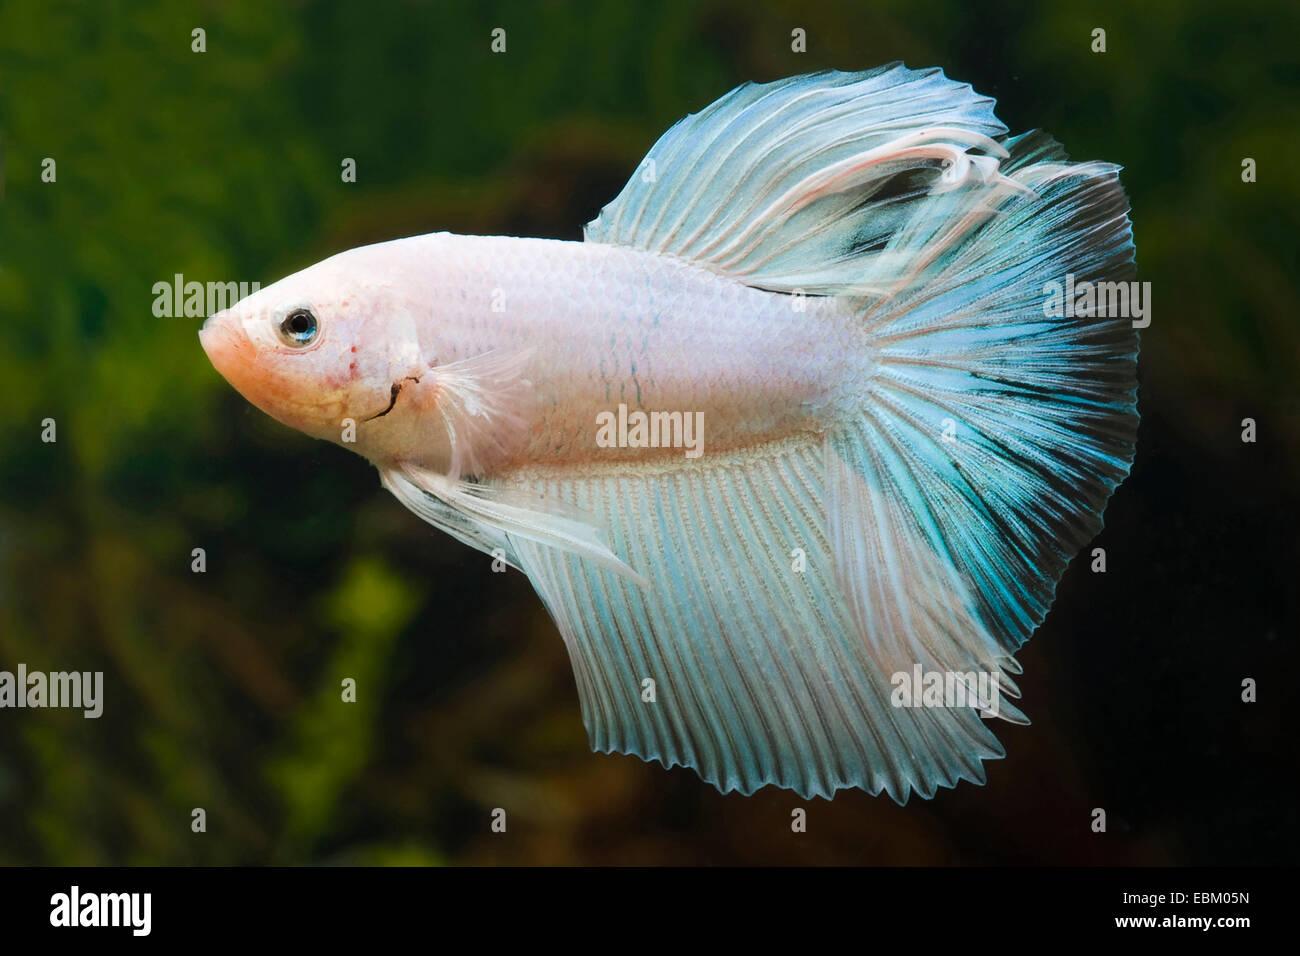 Siamese fighting fish siamese fighter stockfotos siamese for Siamesische kampffische